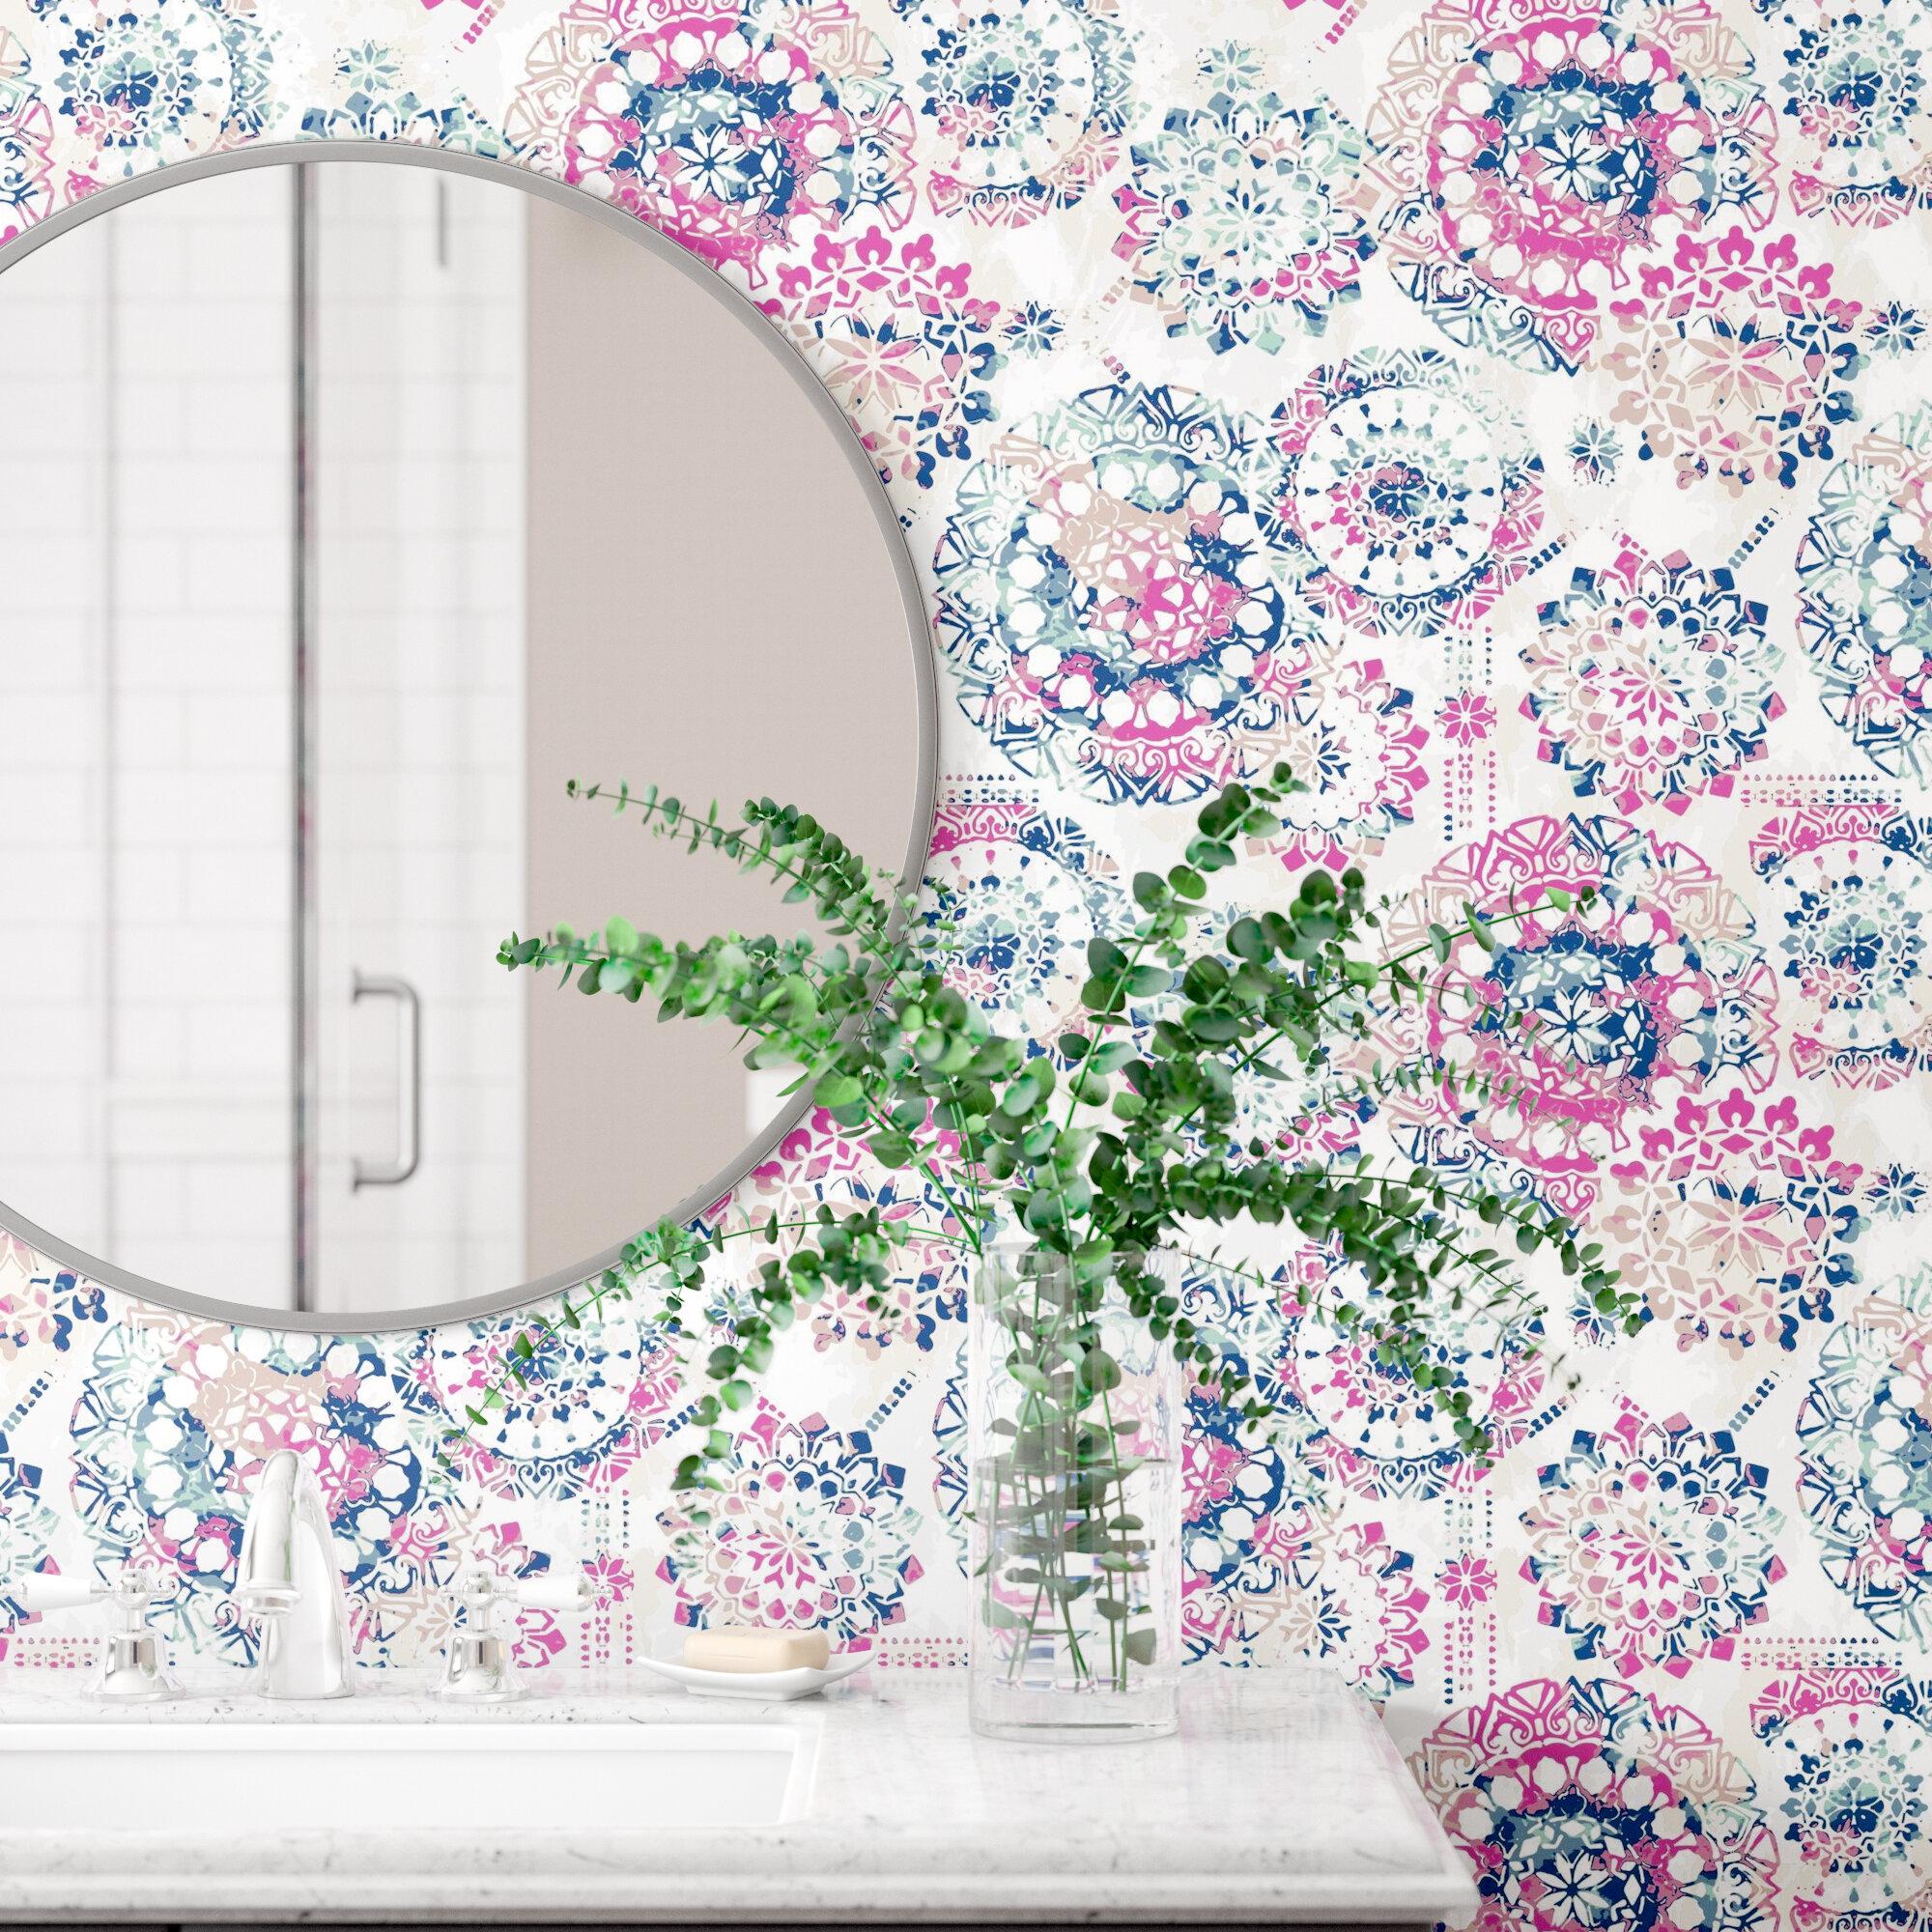 Destiney Bohemian 16 5 L X 20 5 W Floral And Botanical Peel And Stick Wallpaper Roll Reviews Joss Main